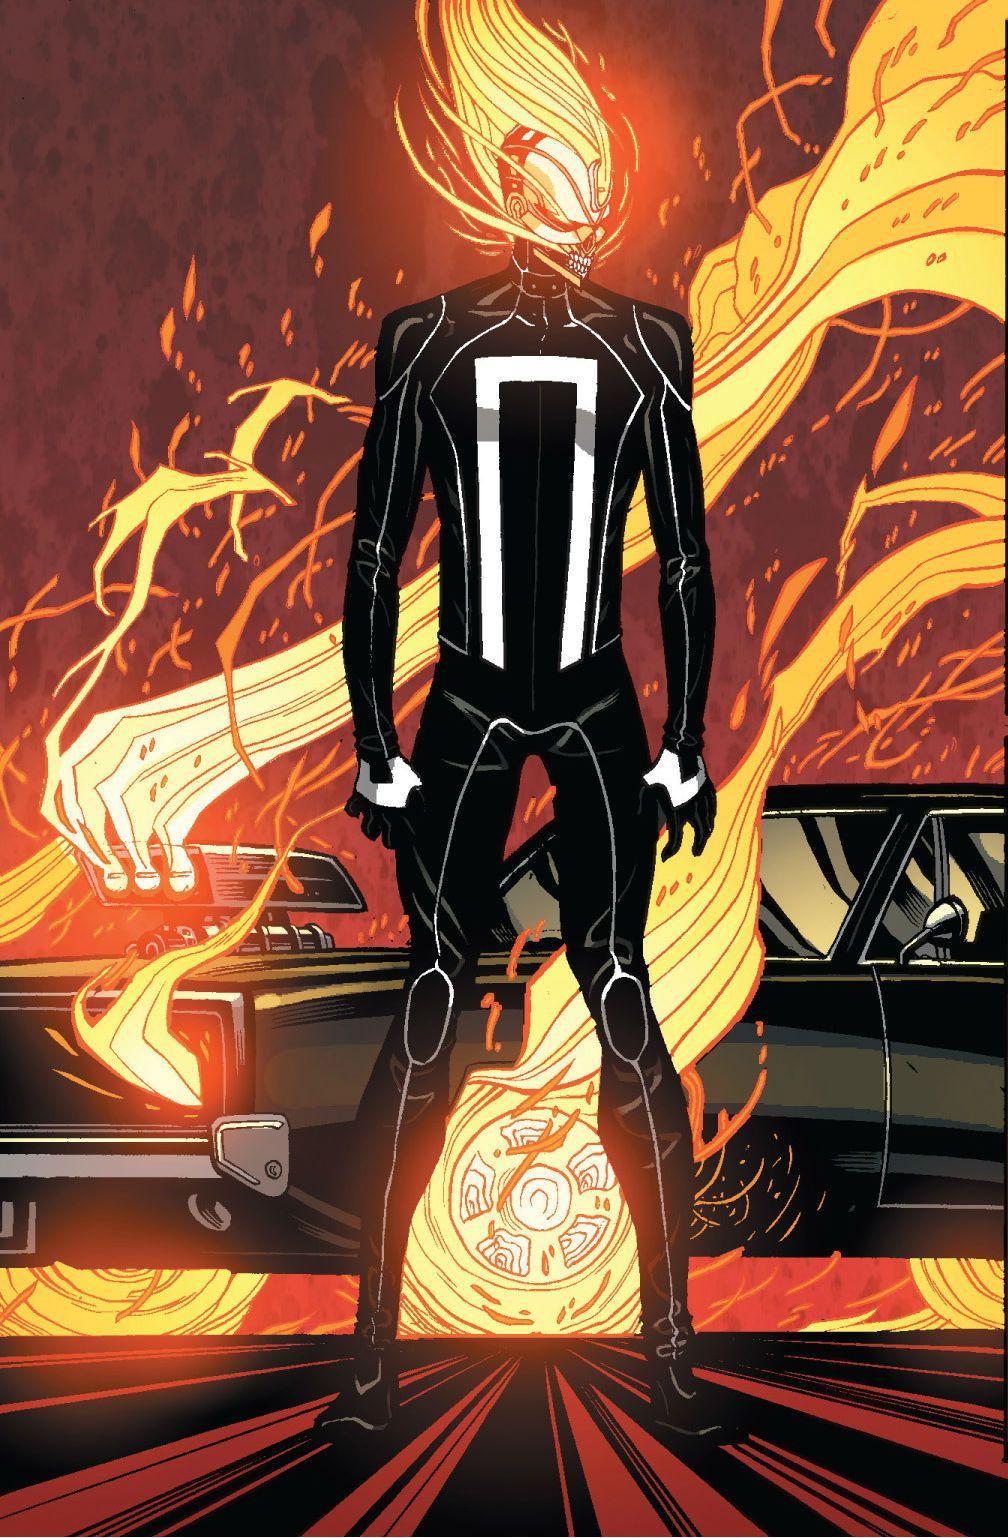 Ghost Rider (Robbie Reyes) by Tradd Moore | Cartoon favs